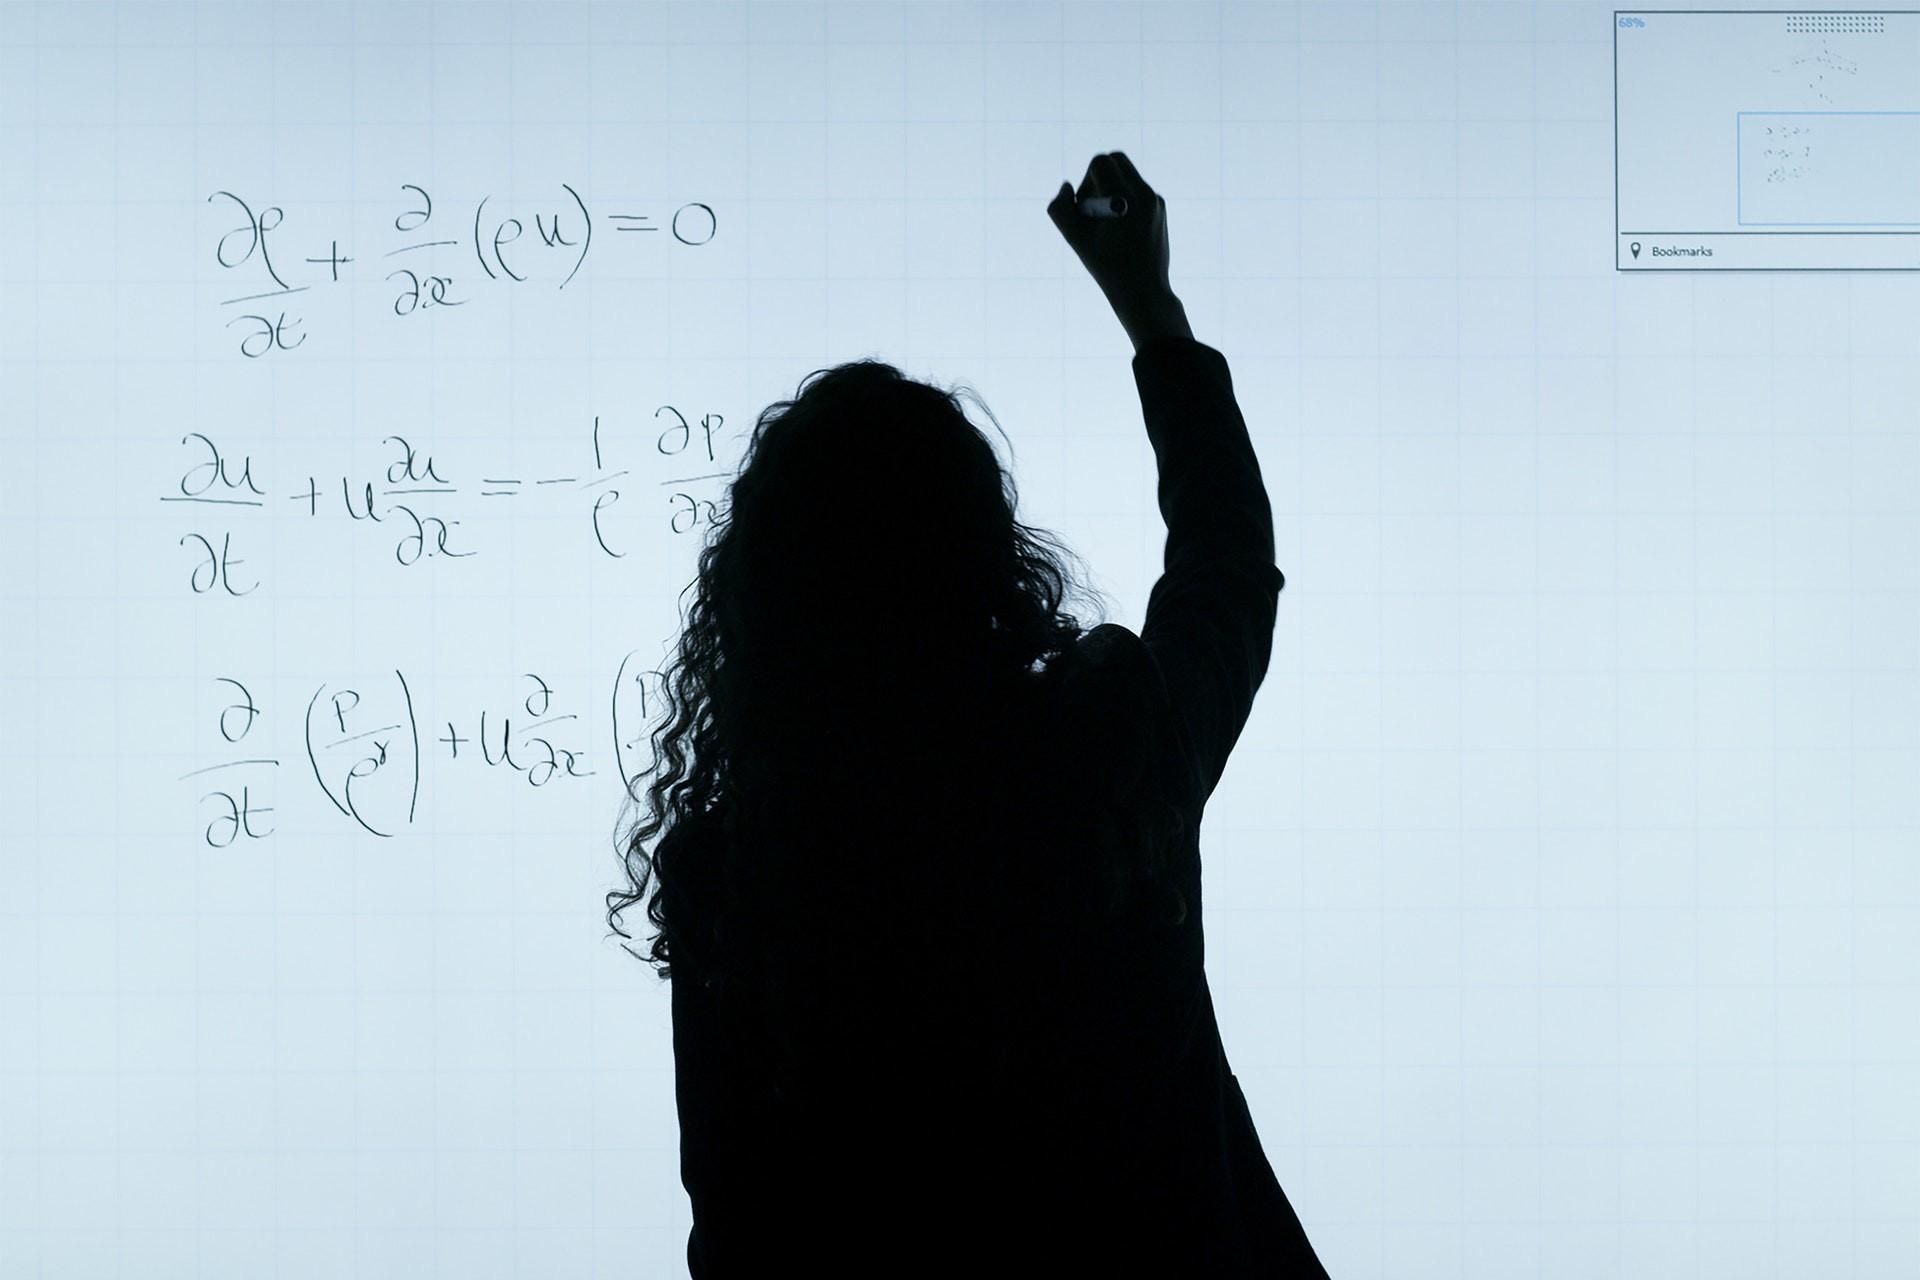 matemáticas lomloe